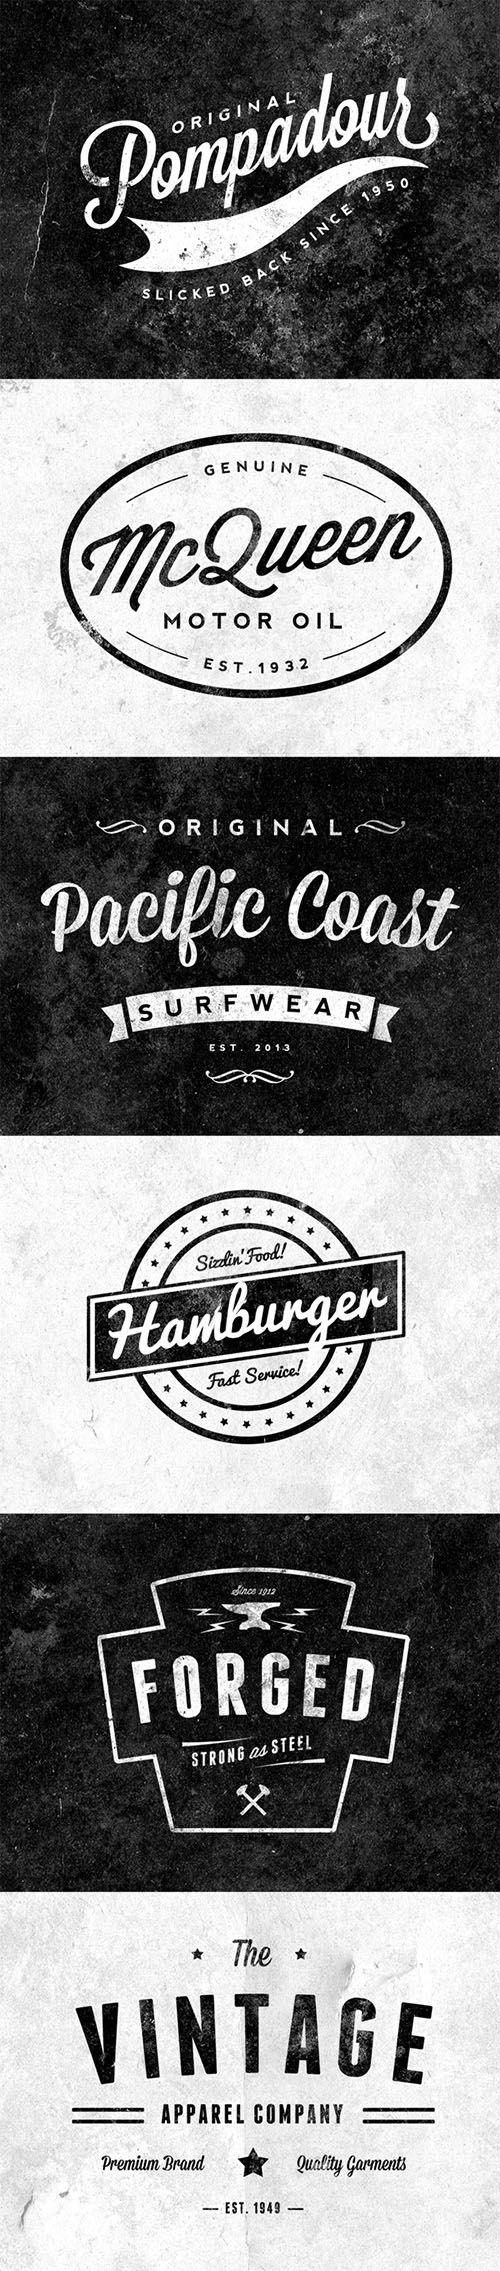 vintage american logo design ideas www.cheap-logo-design.co.uk #vintagelogo #americanlogo #logovintage